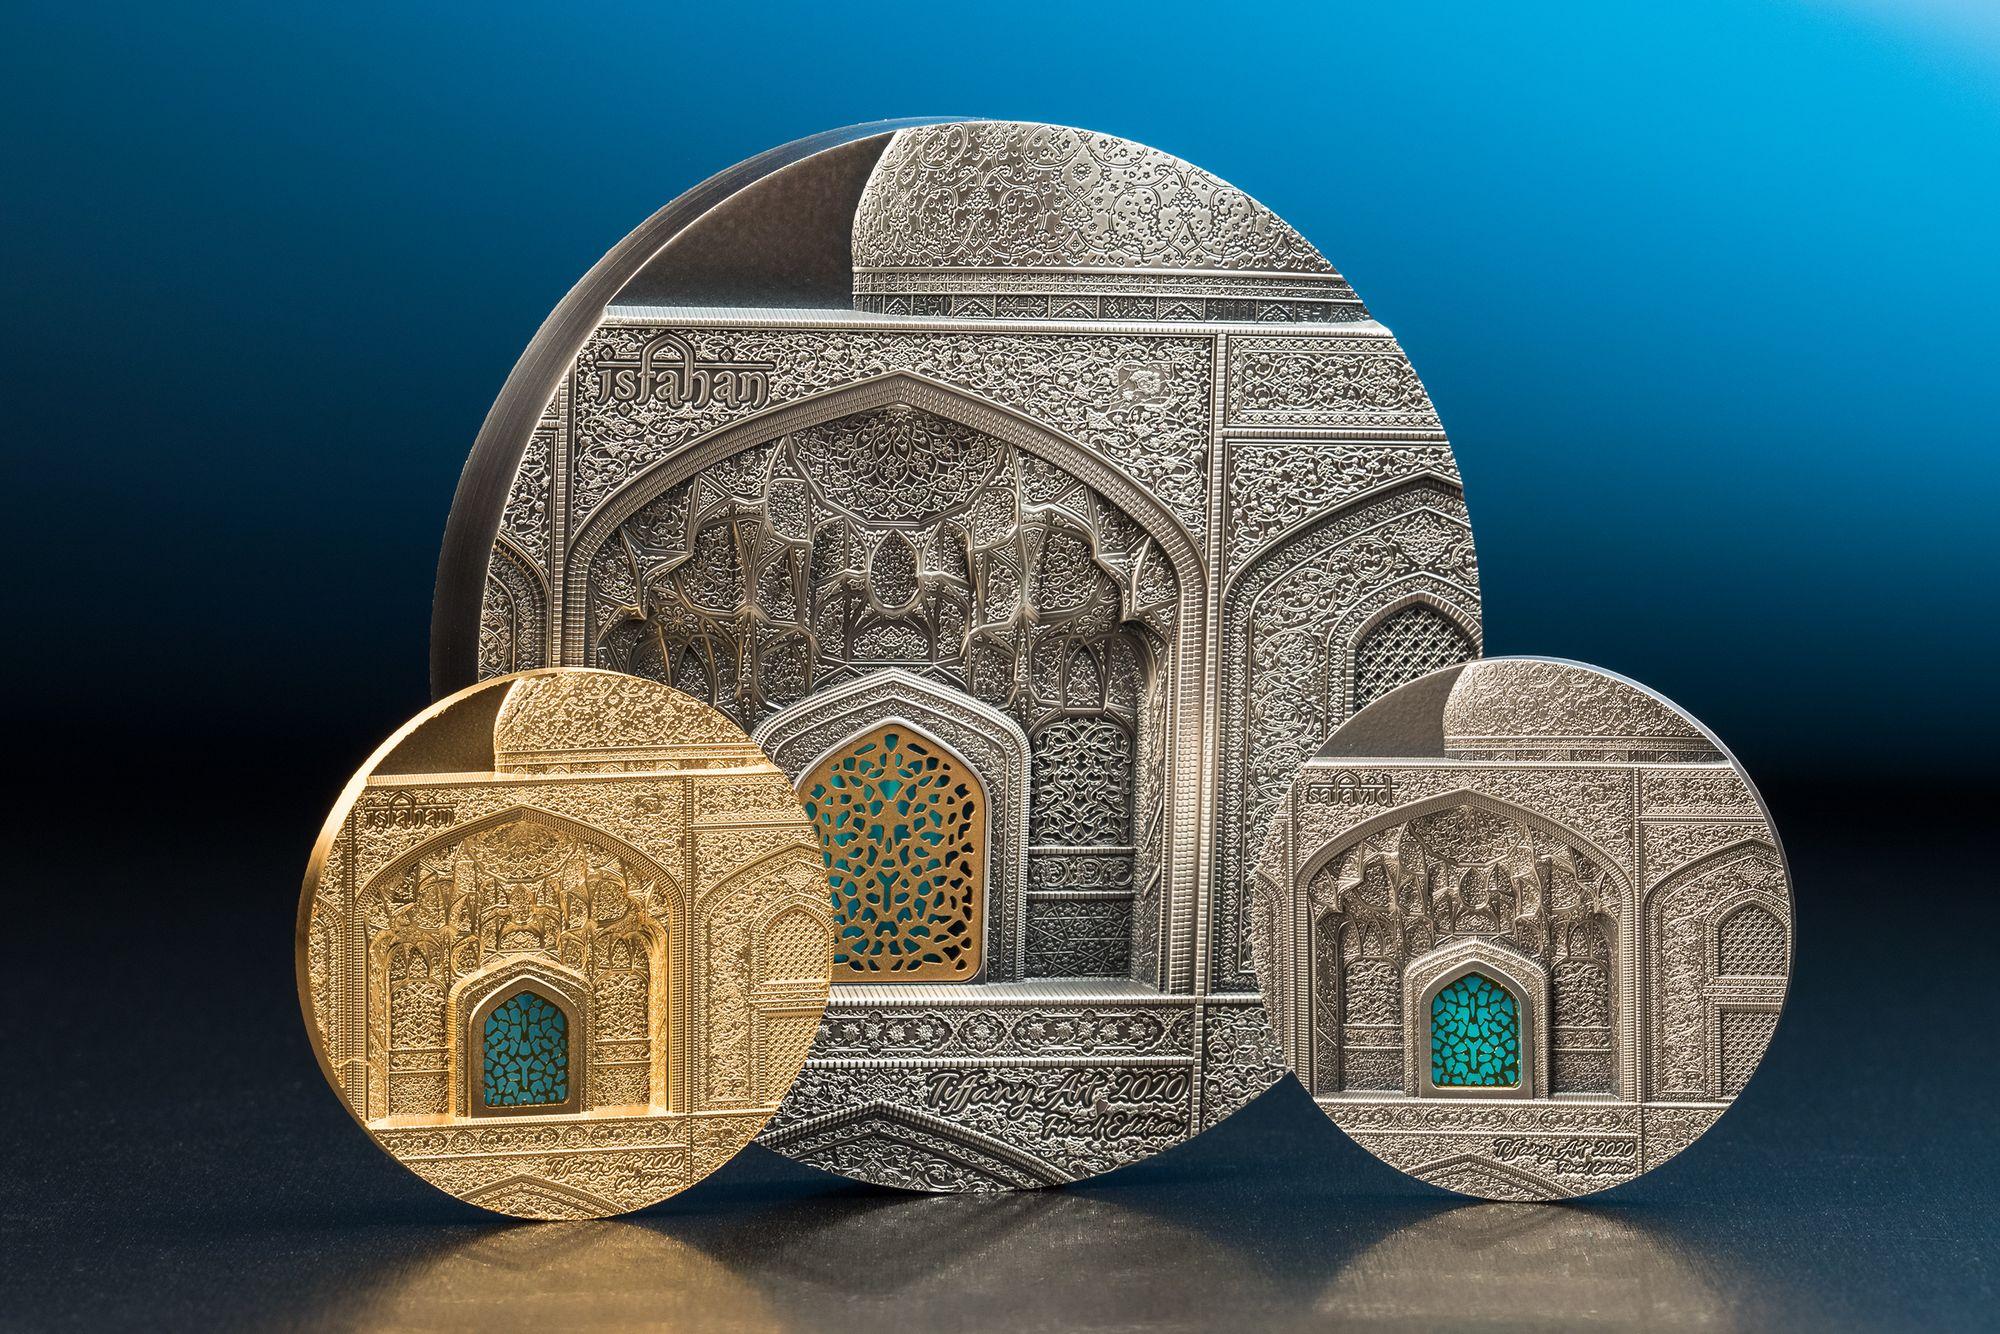 2020 Tiffany Art Safavid 2oz Silver Coin